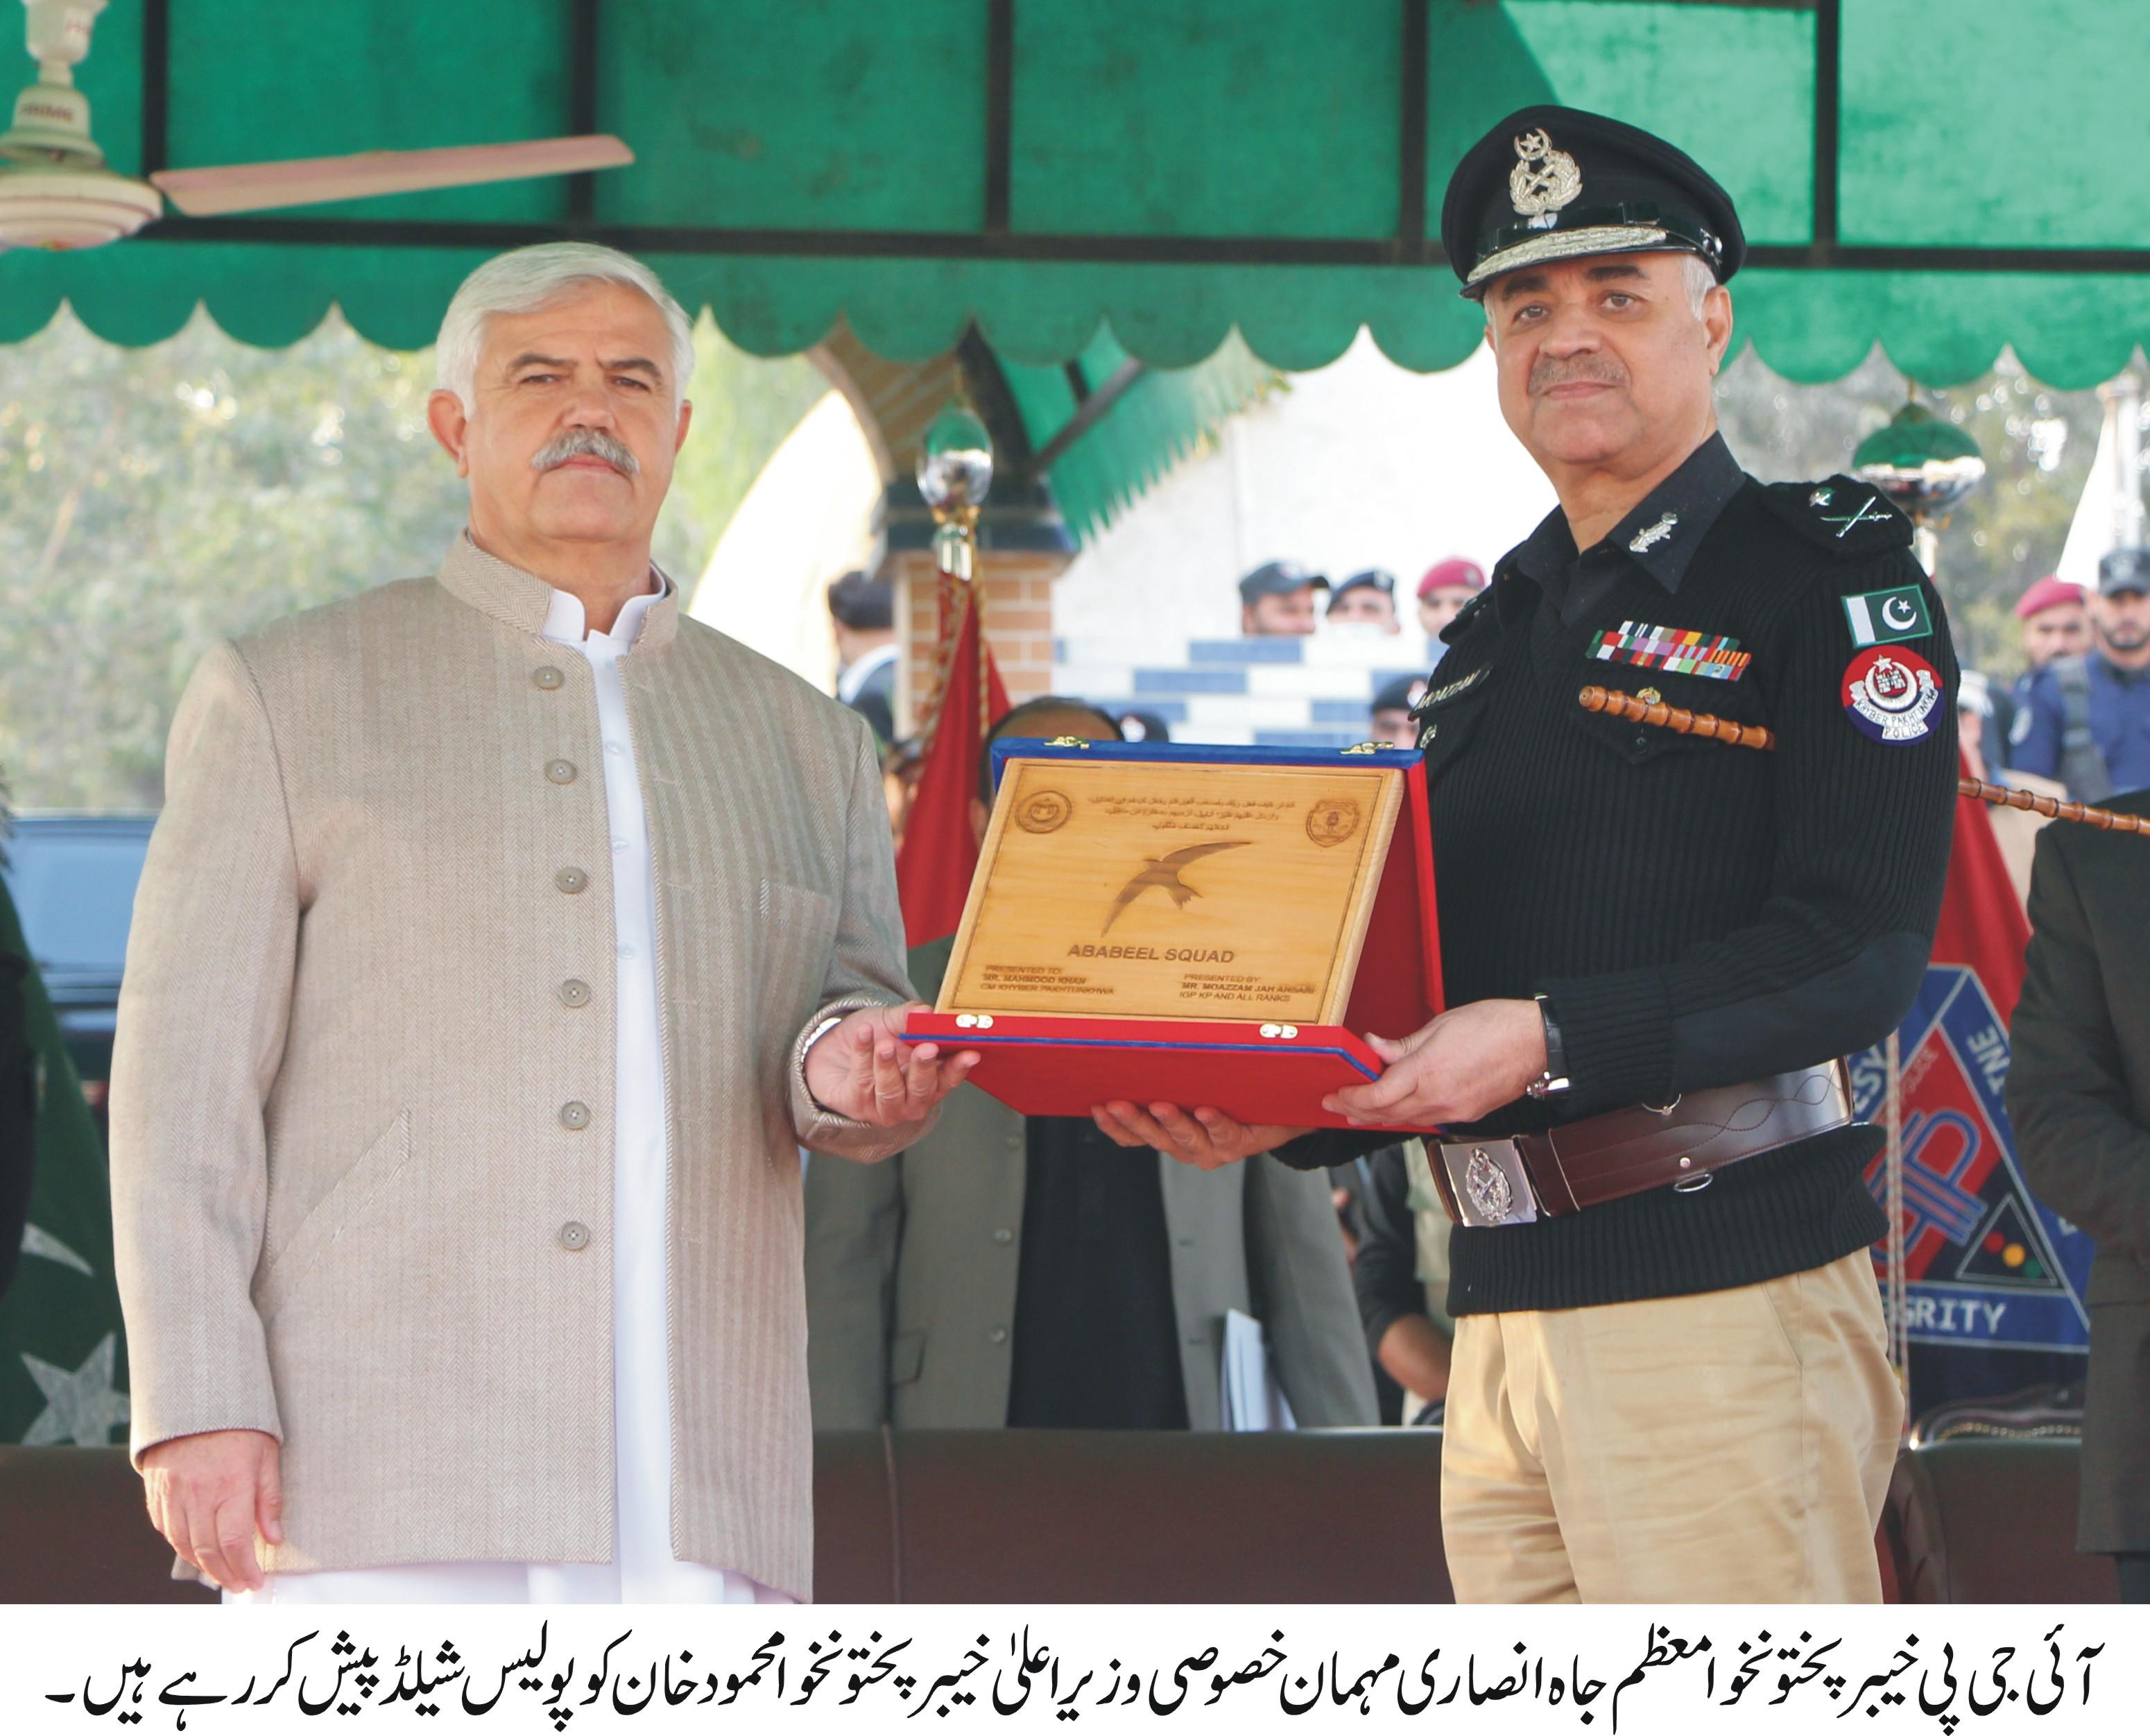 Khyber Pakhtunkhwa Police - Official Portal